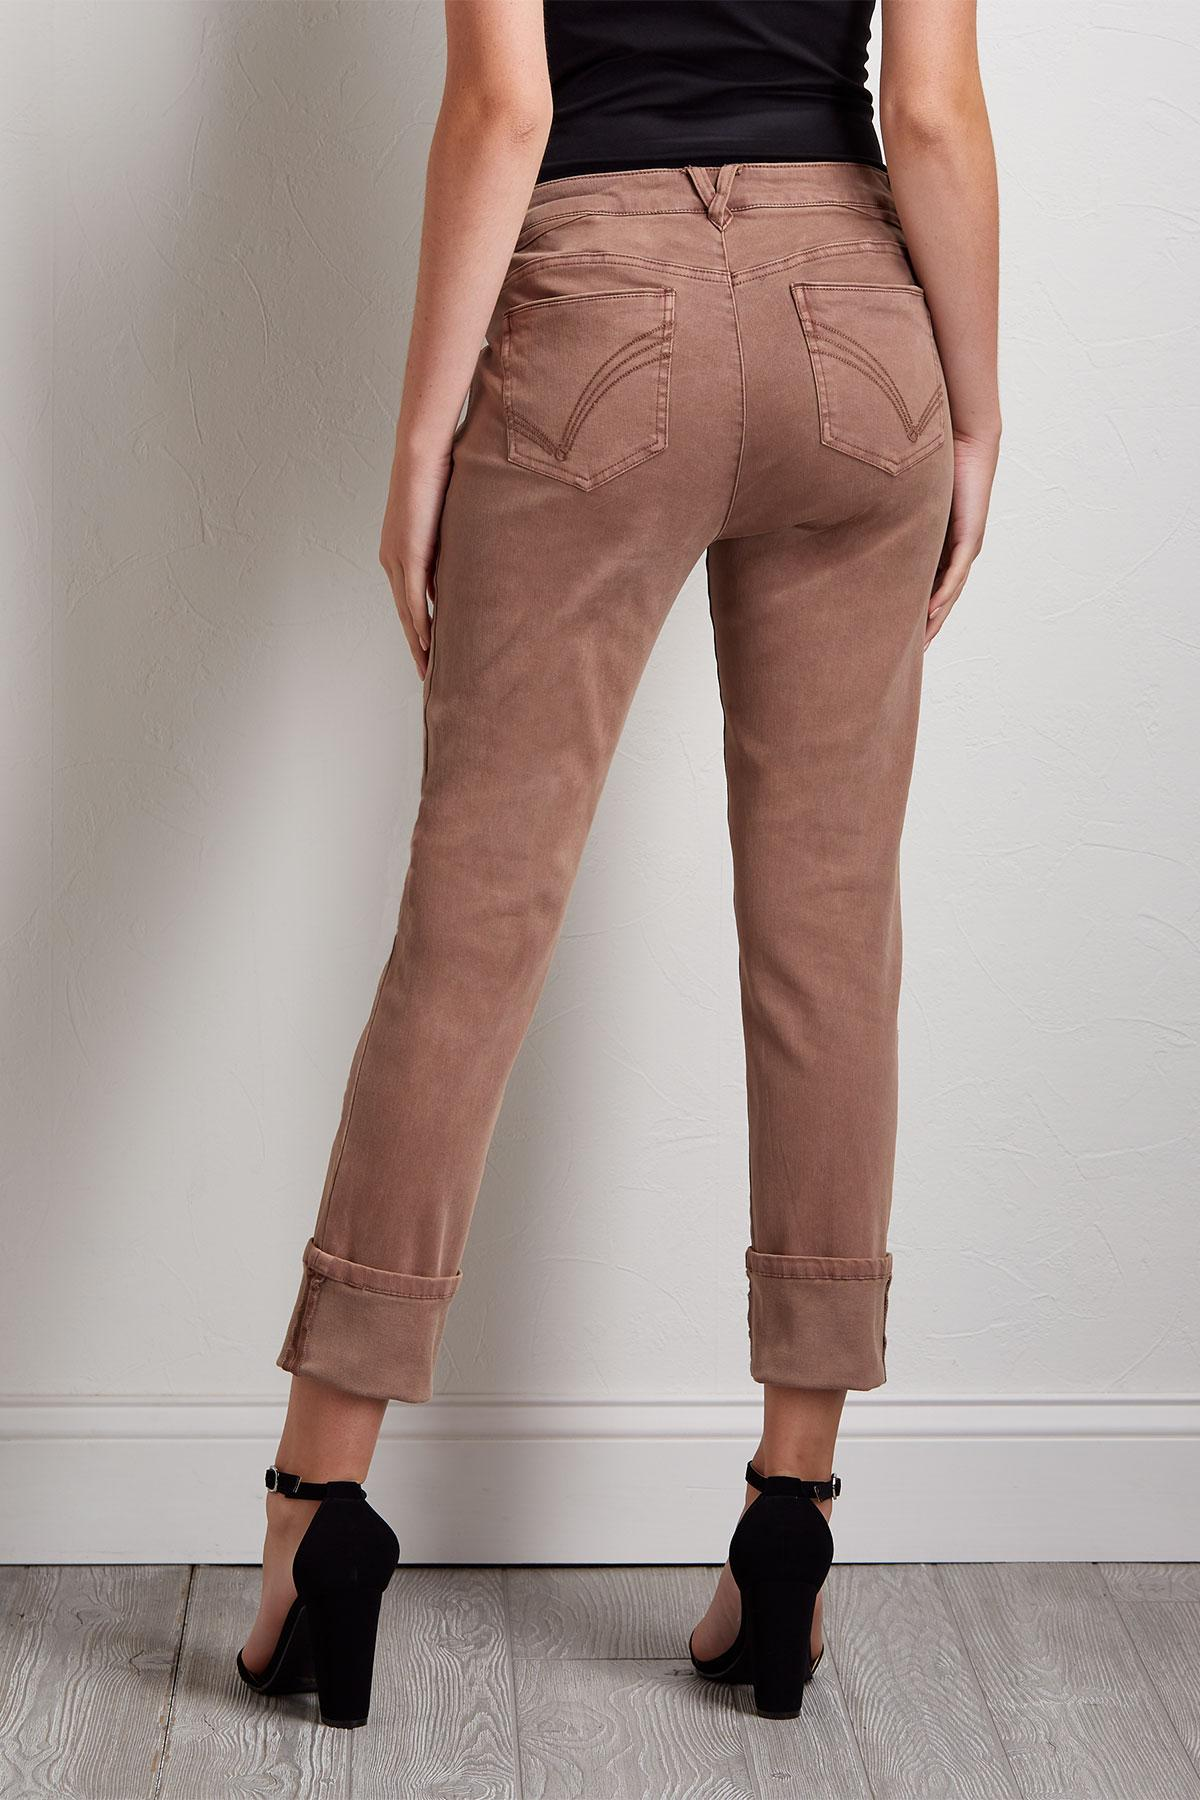 Wild Rose Girlfriend Jeans